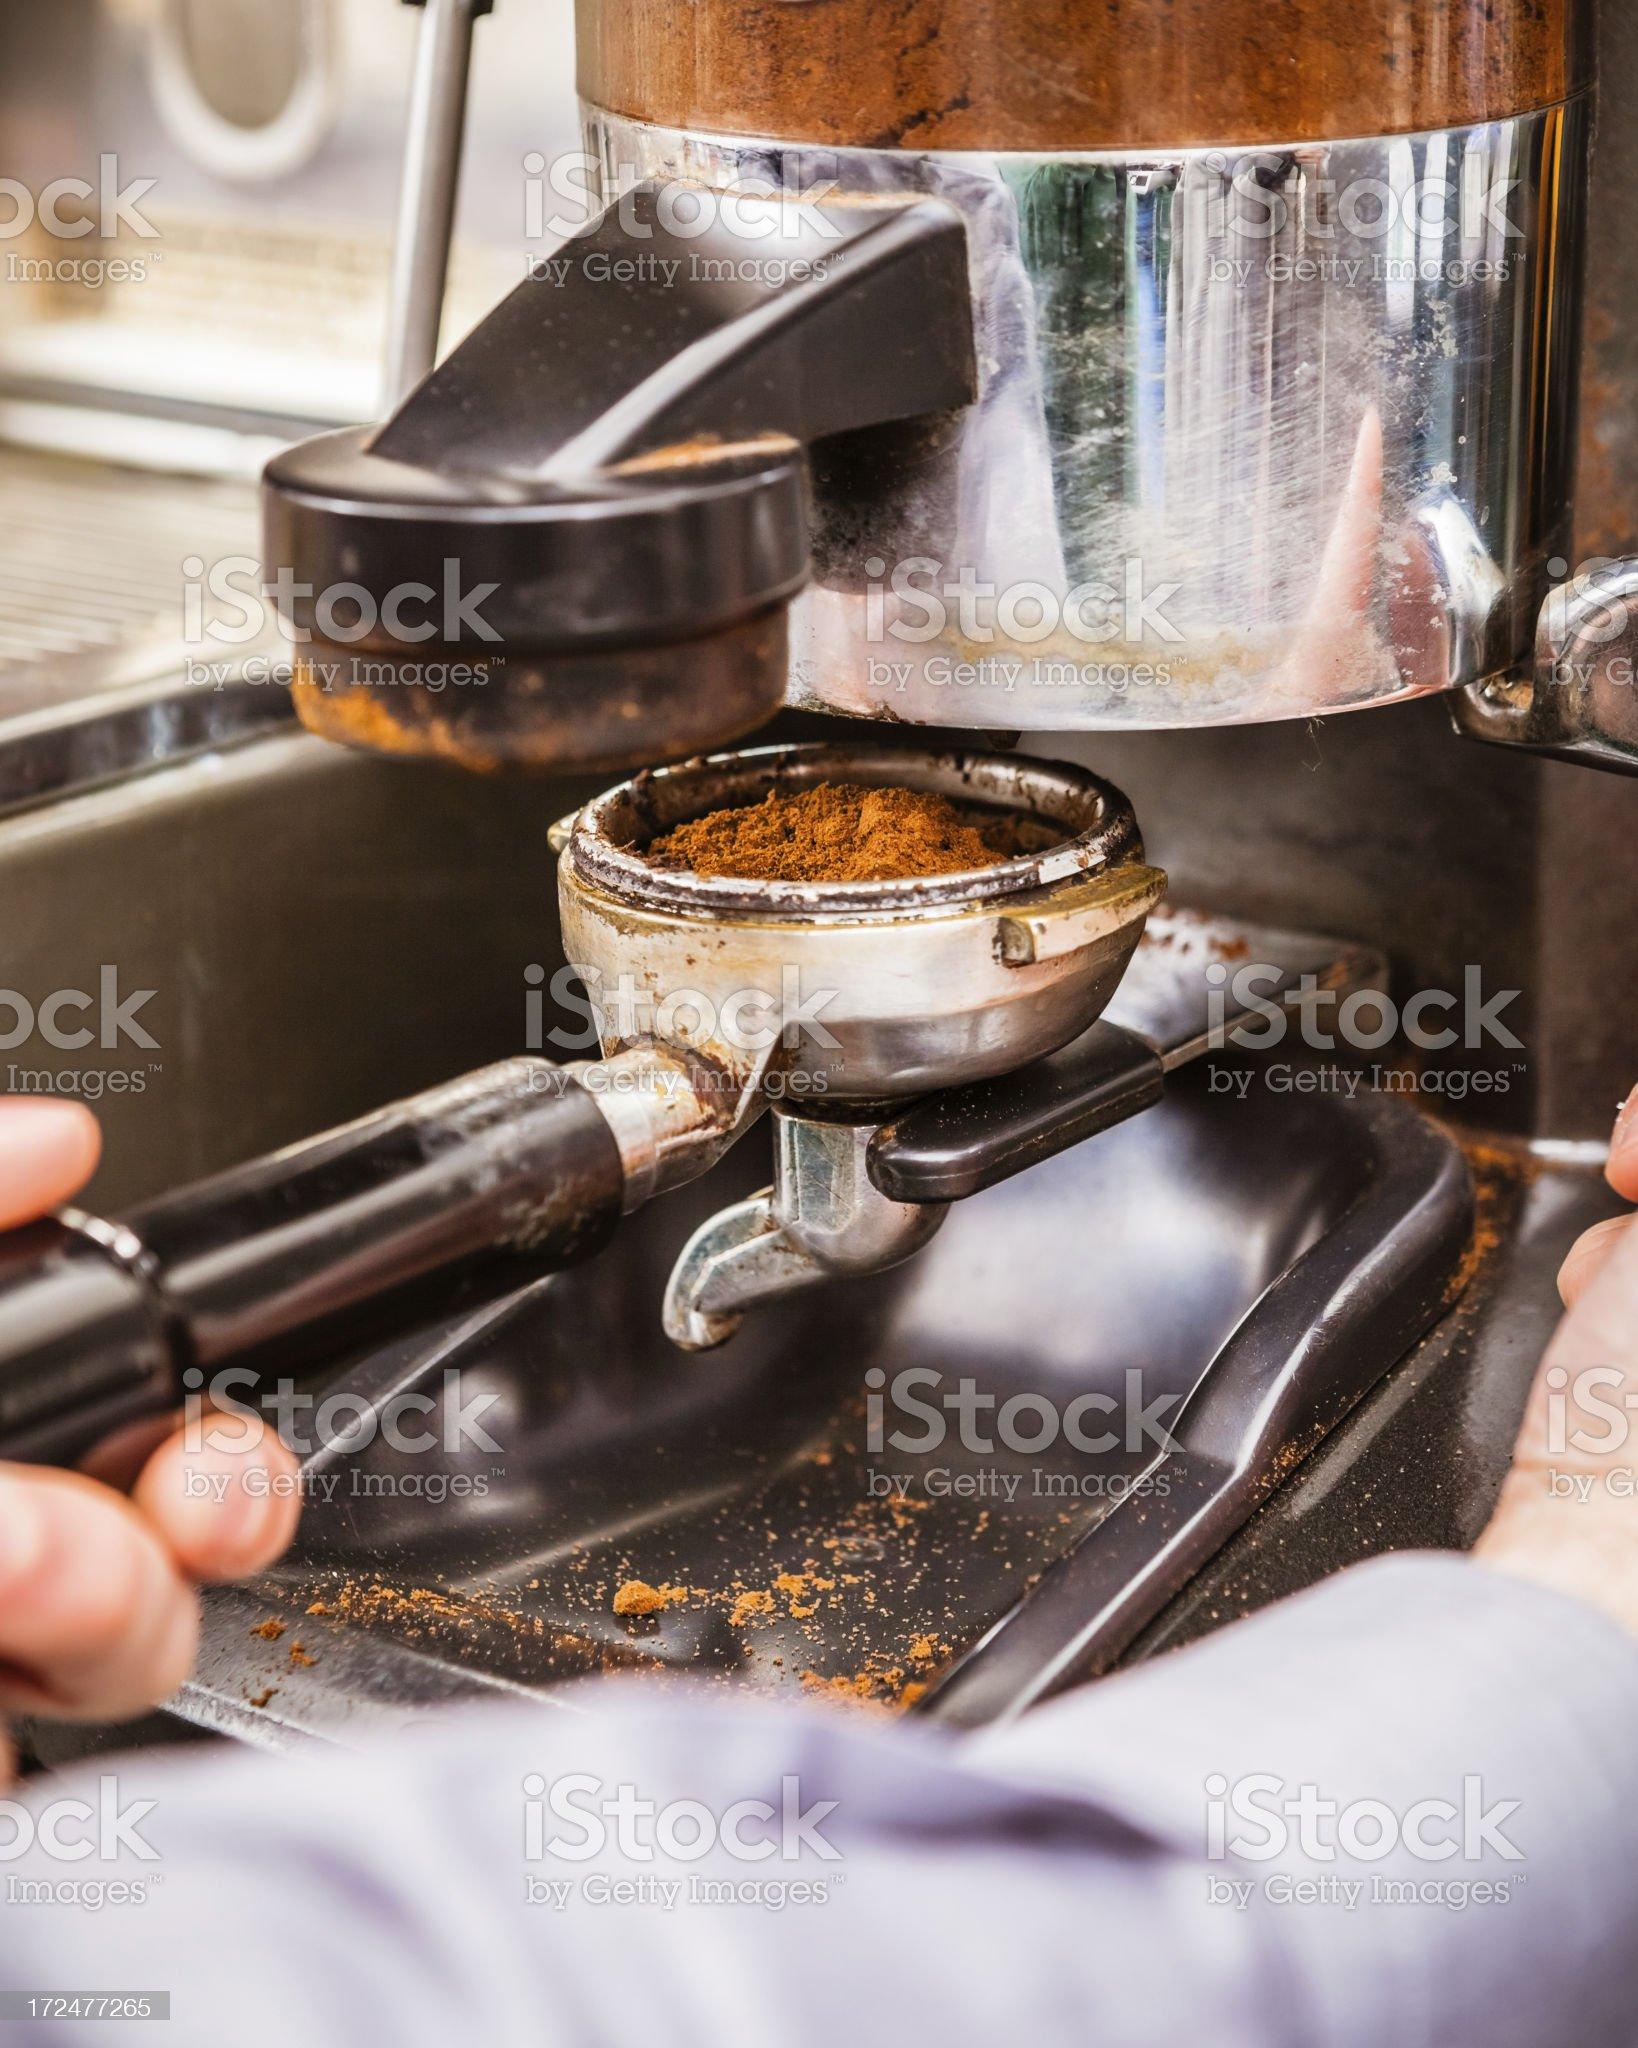 Preparing Espresso Coffee, Professional Machine royalty-free stock photo